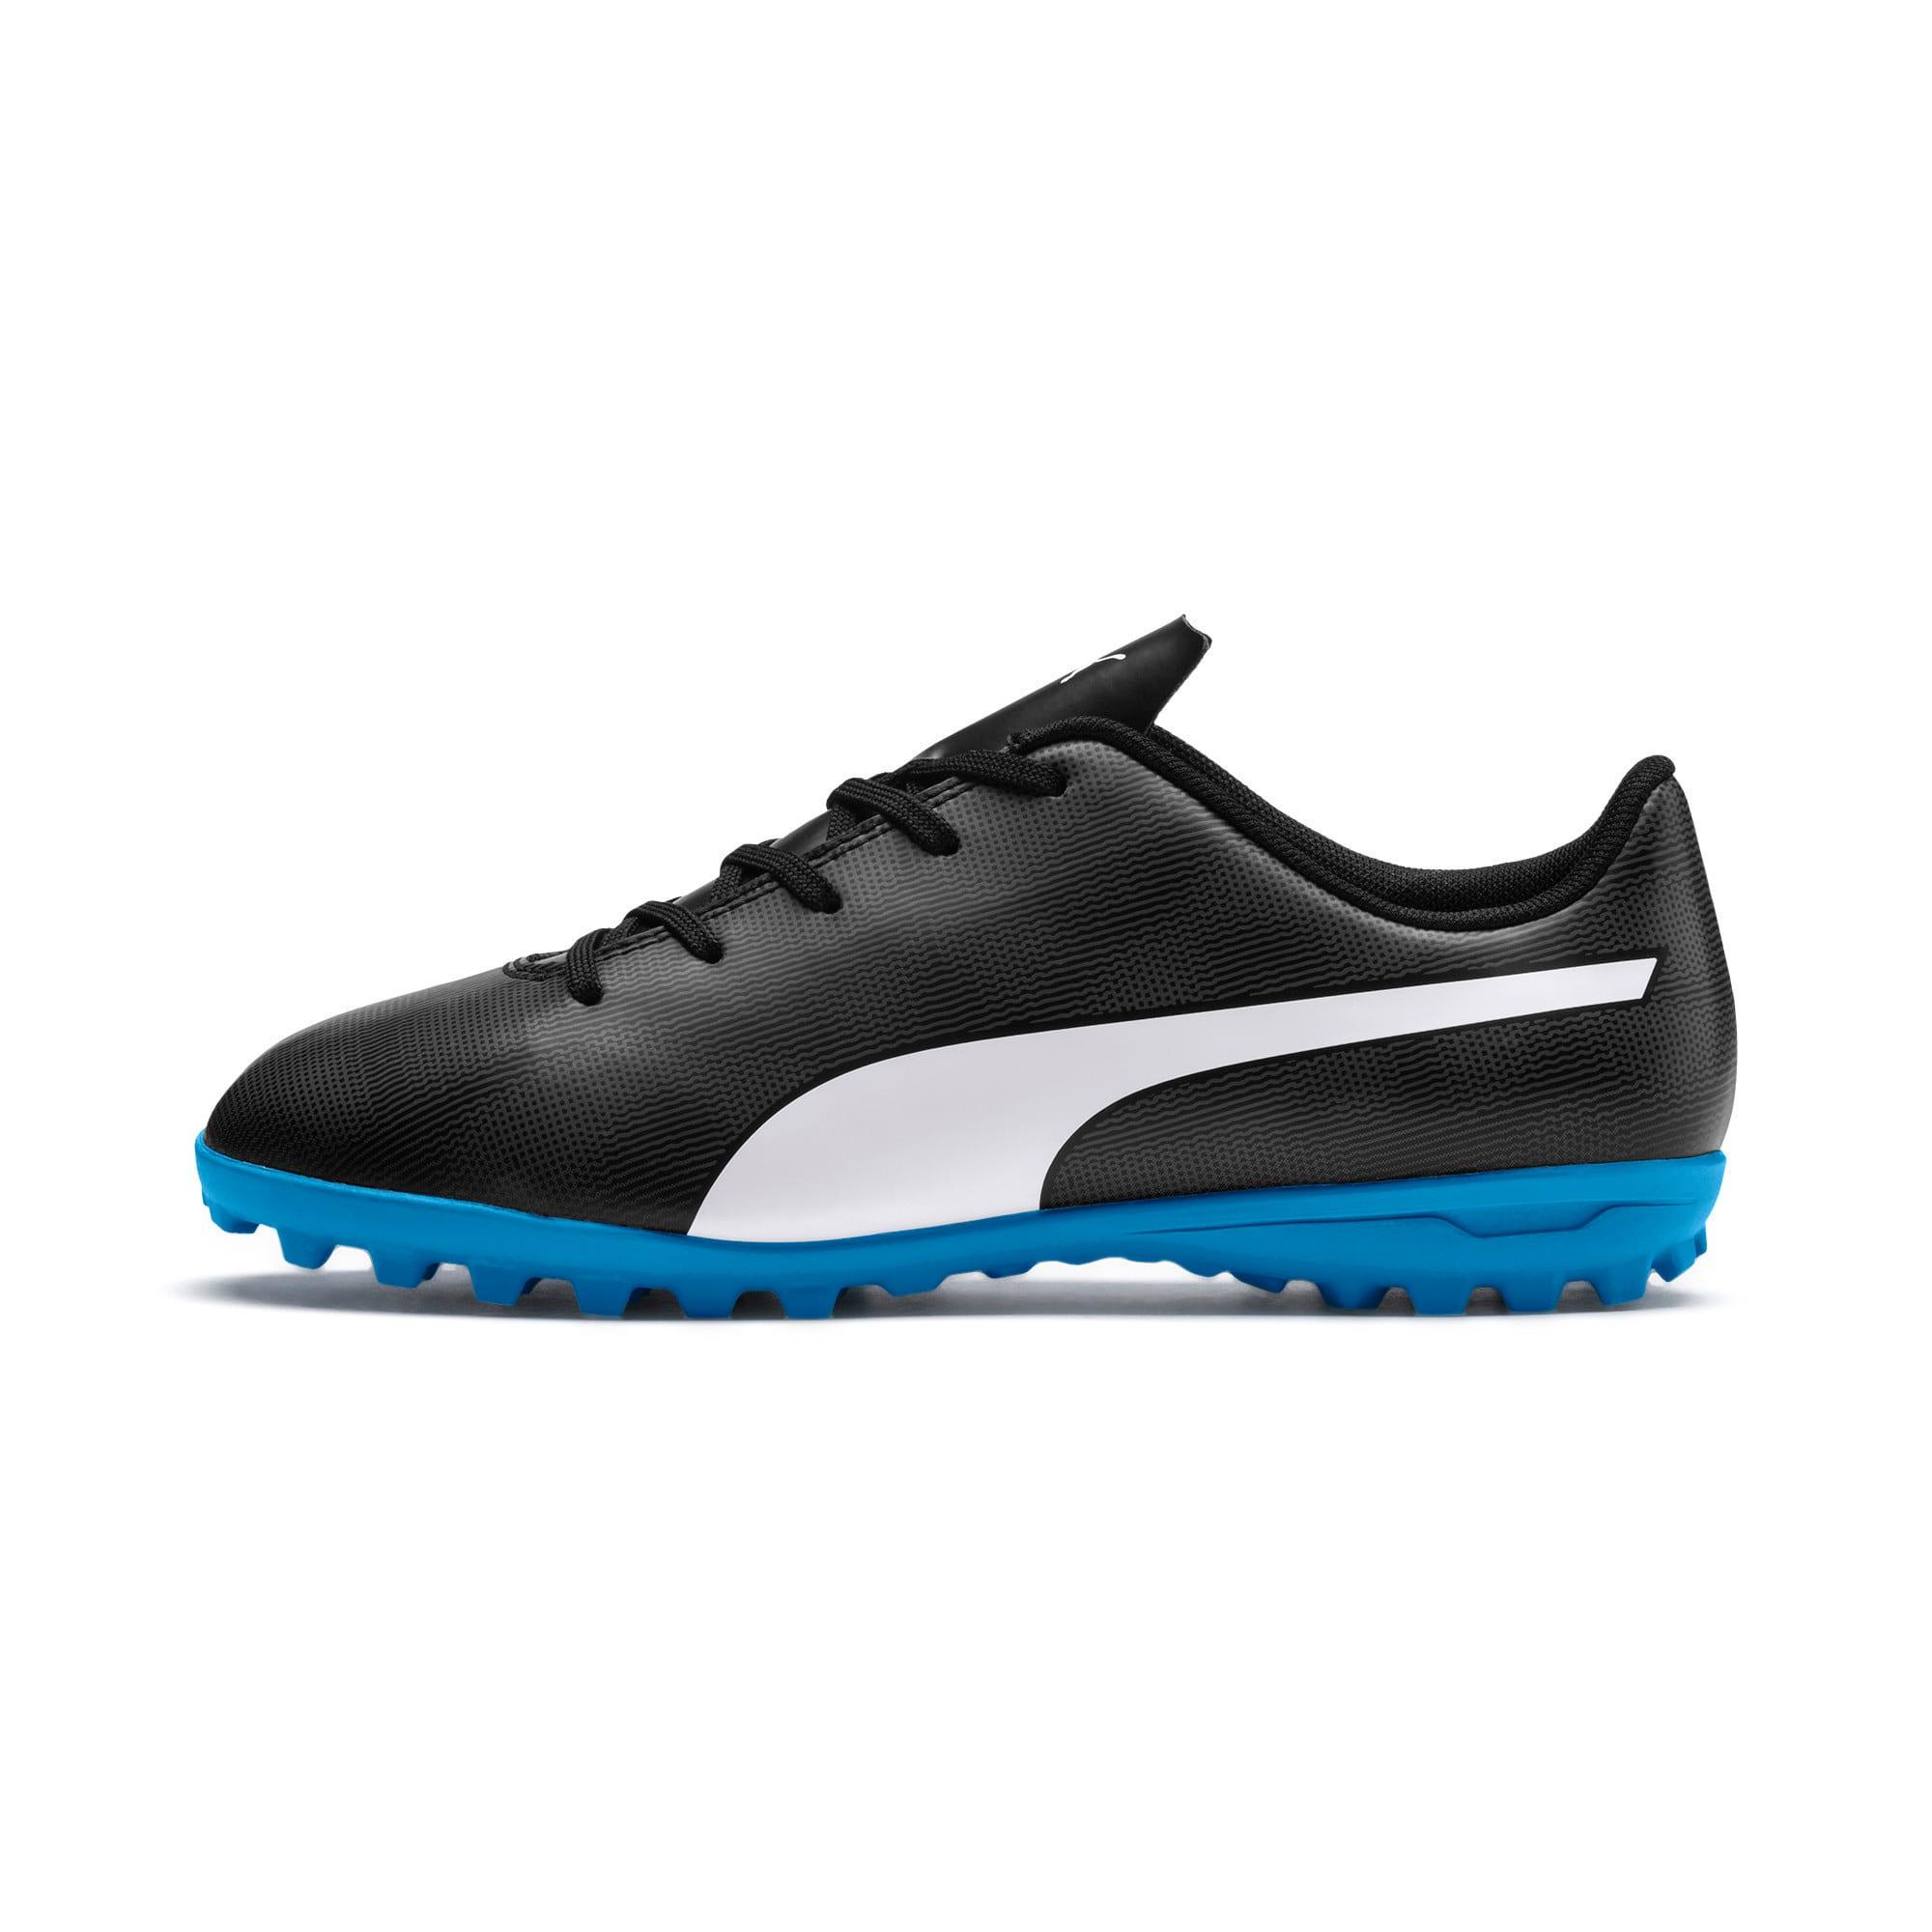 Thumbnail 1 of Rapido TT Youth Football Boots, Black-White-Iron Gate-Bleu, medium-IND